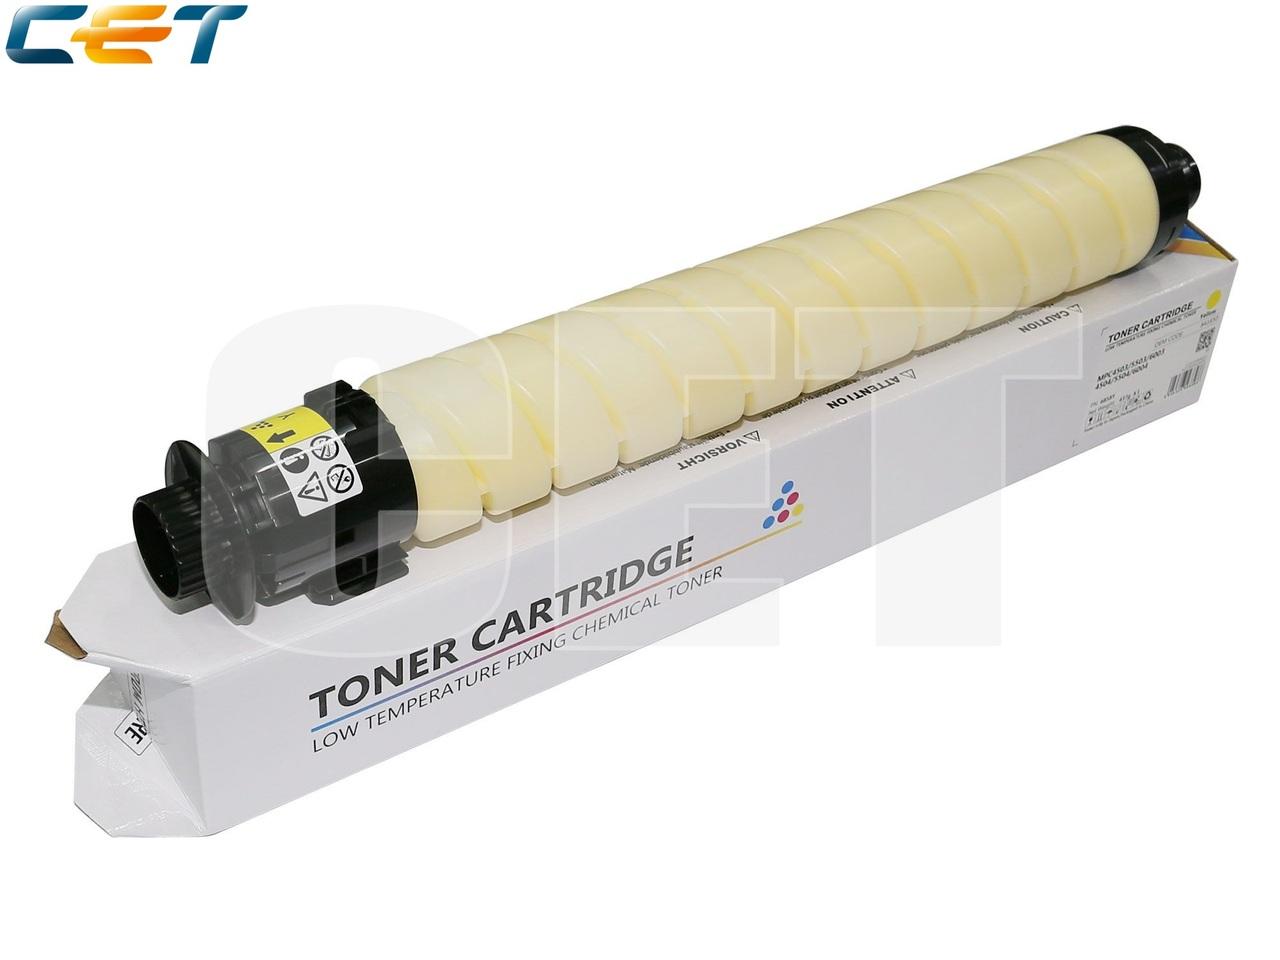 Тонер-картридж (CPP, HT8) 841854 для RICOH AficioMPC4503/5503/6003 (CET) Yellow, (WW), 437г, 22500 стр.,CET6858Y